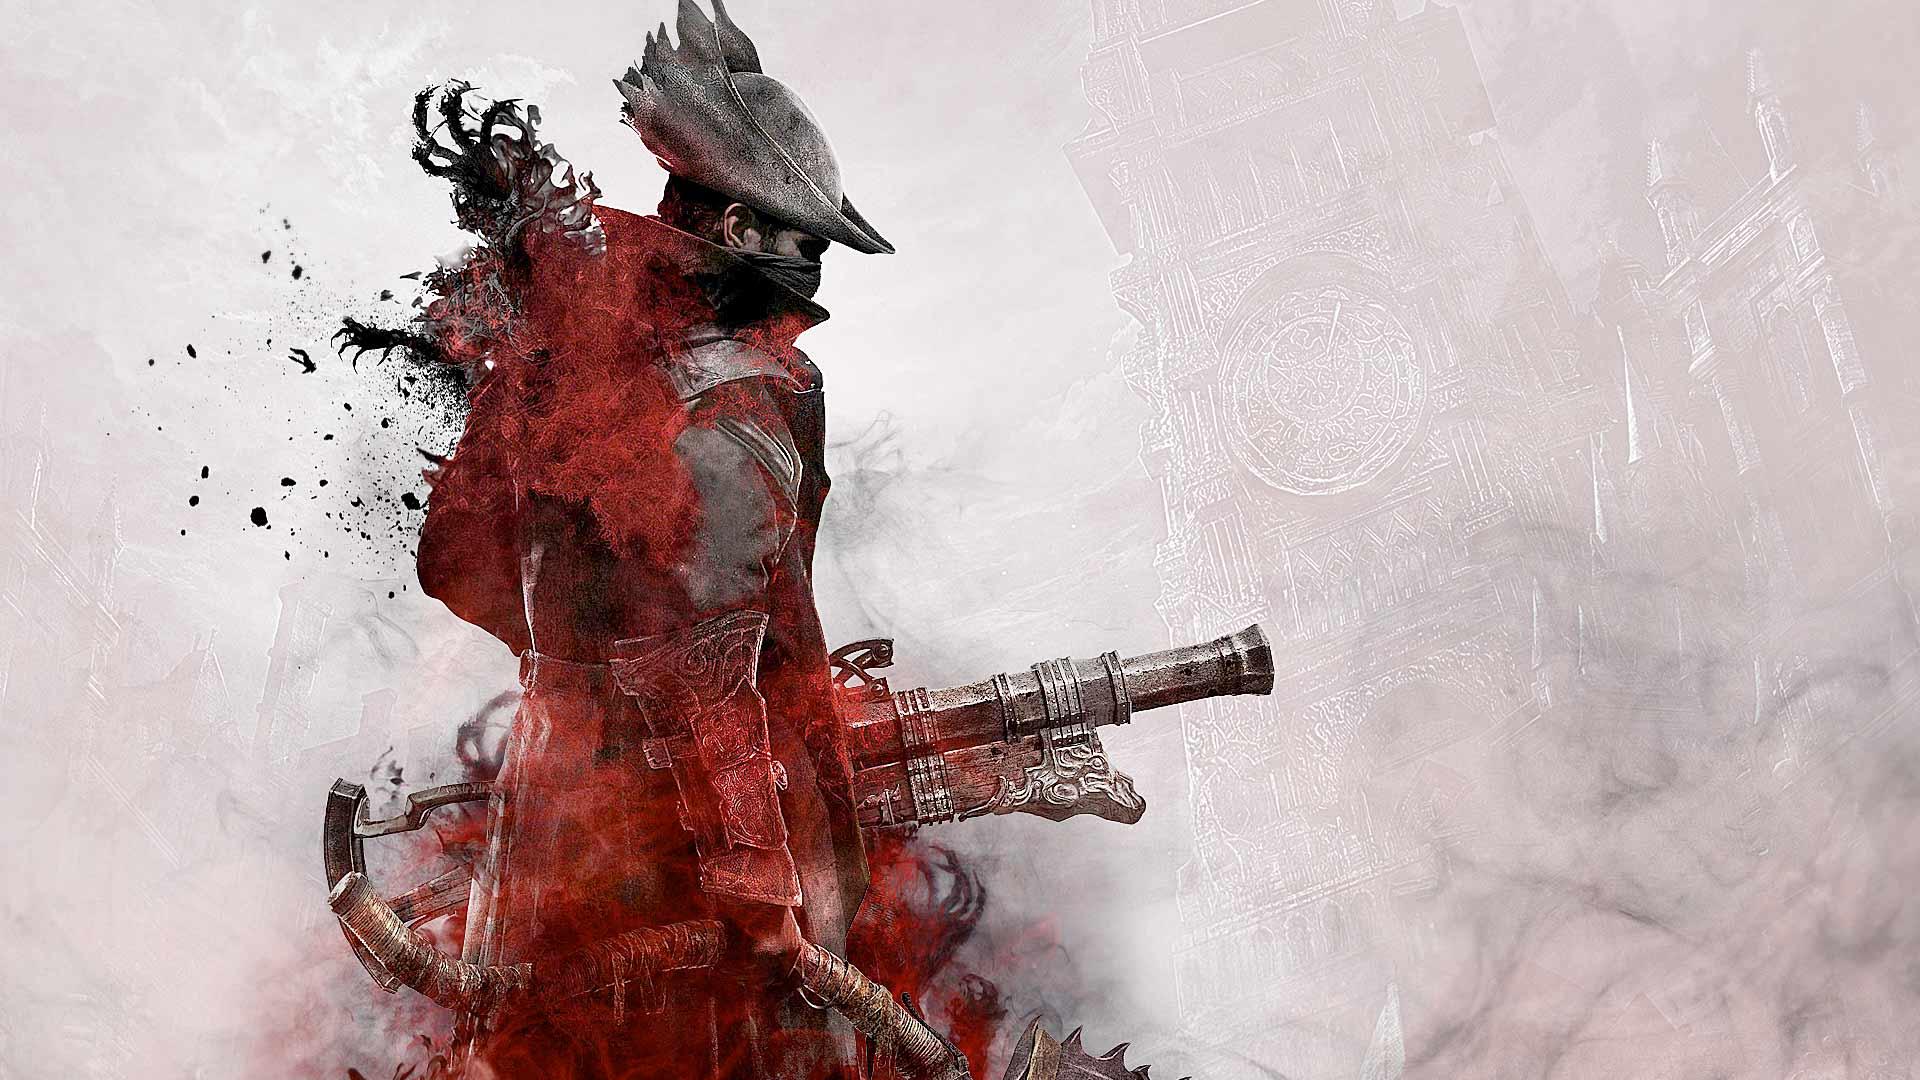 Ps4 Wallpaper Hd Bloodborne Review Mediastinger